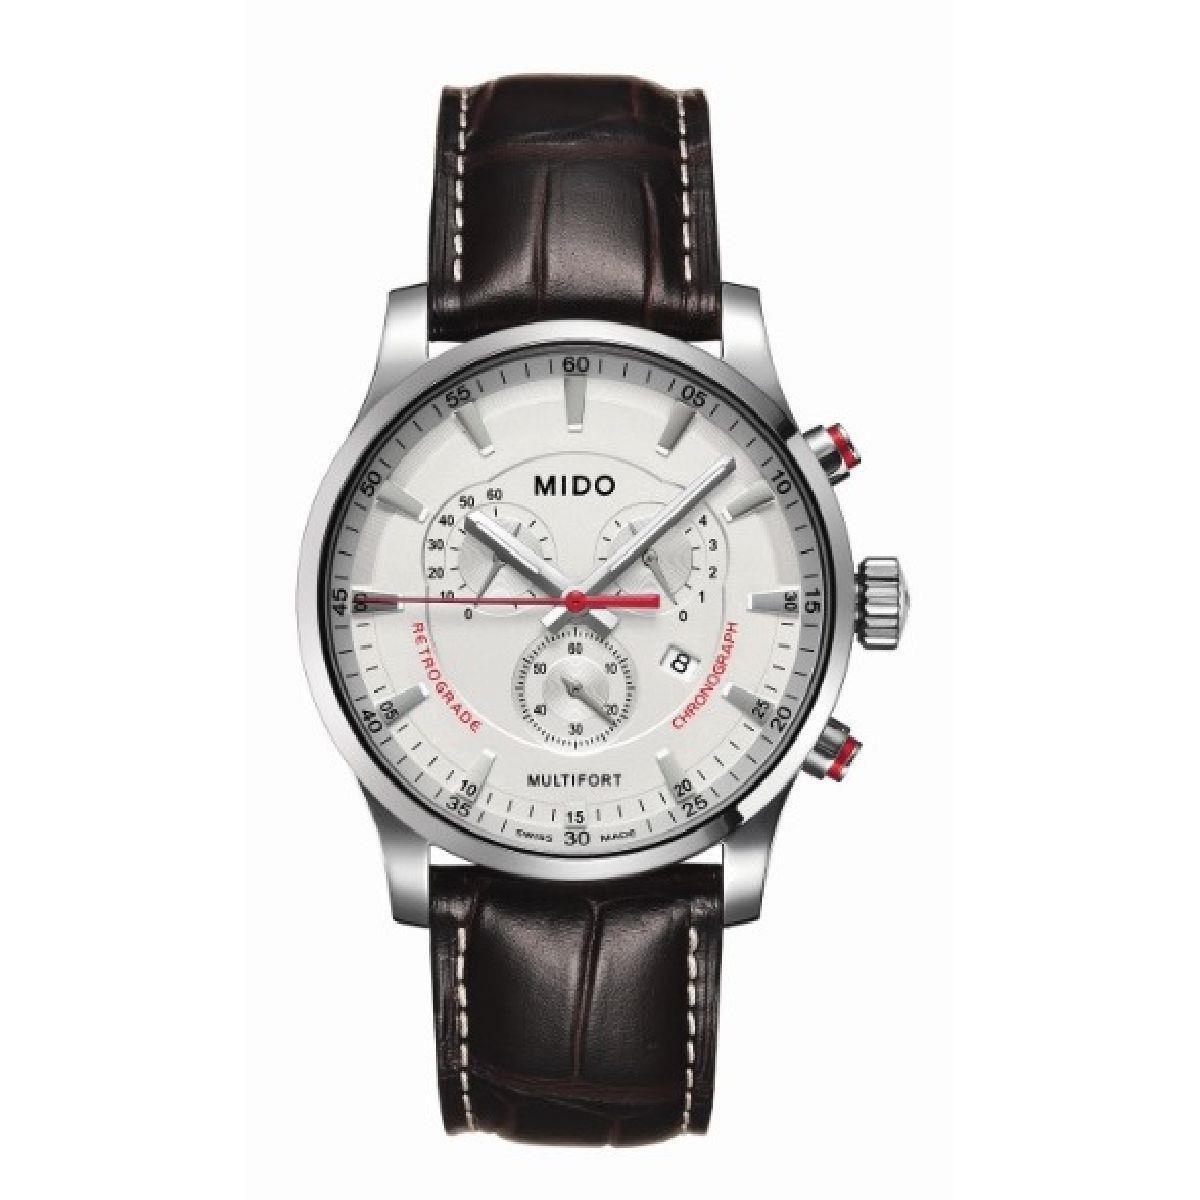 a1ac3b64585 Relógio Masculino Mido - M005.417.16.031.10 - M005.417.16.031.10 - MIDO